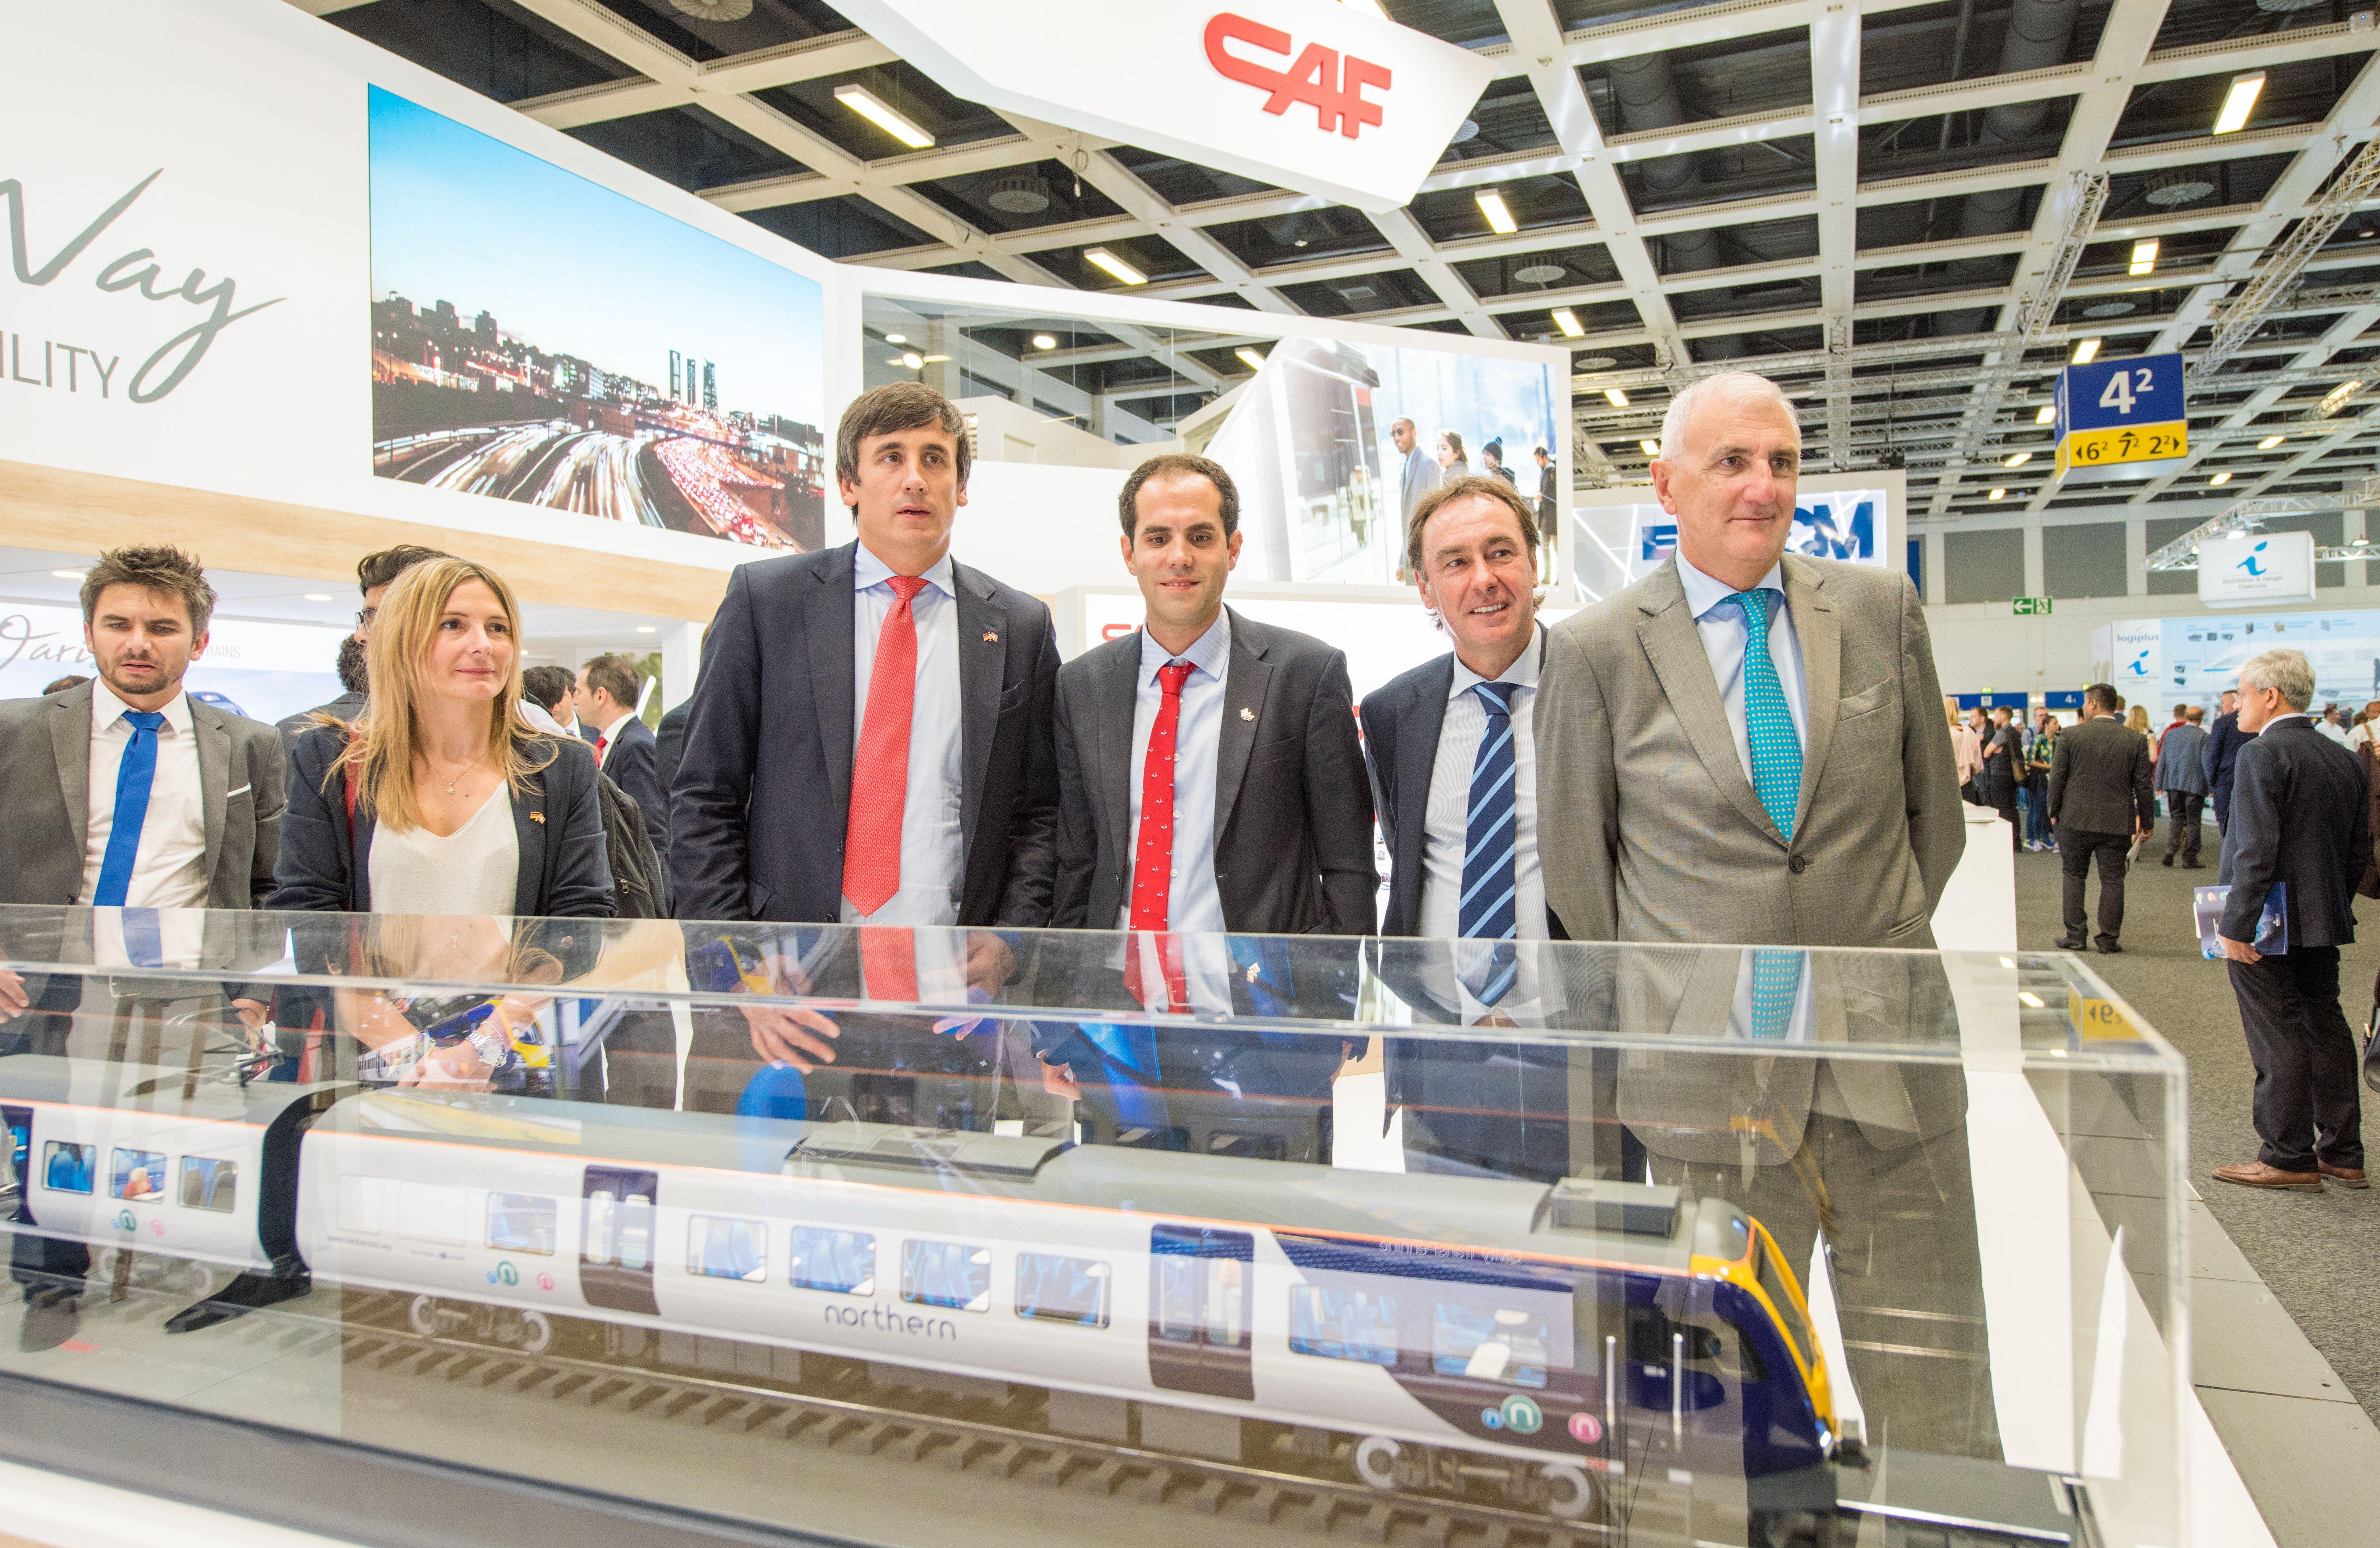 Euskadi presenta tecnología ferroviaria innovadora en la feria Innotrans de Berlín